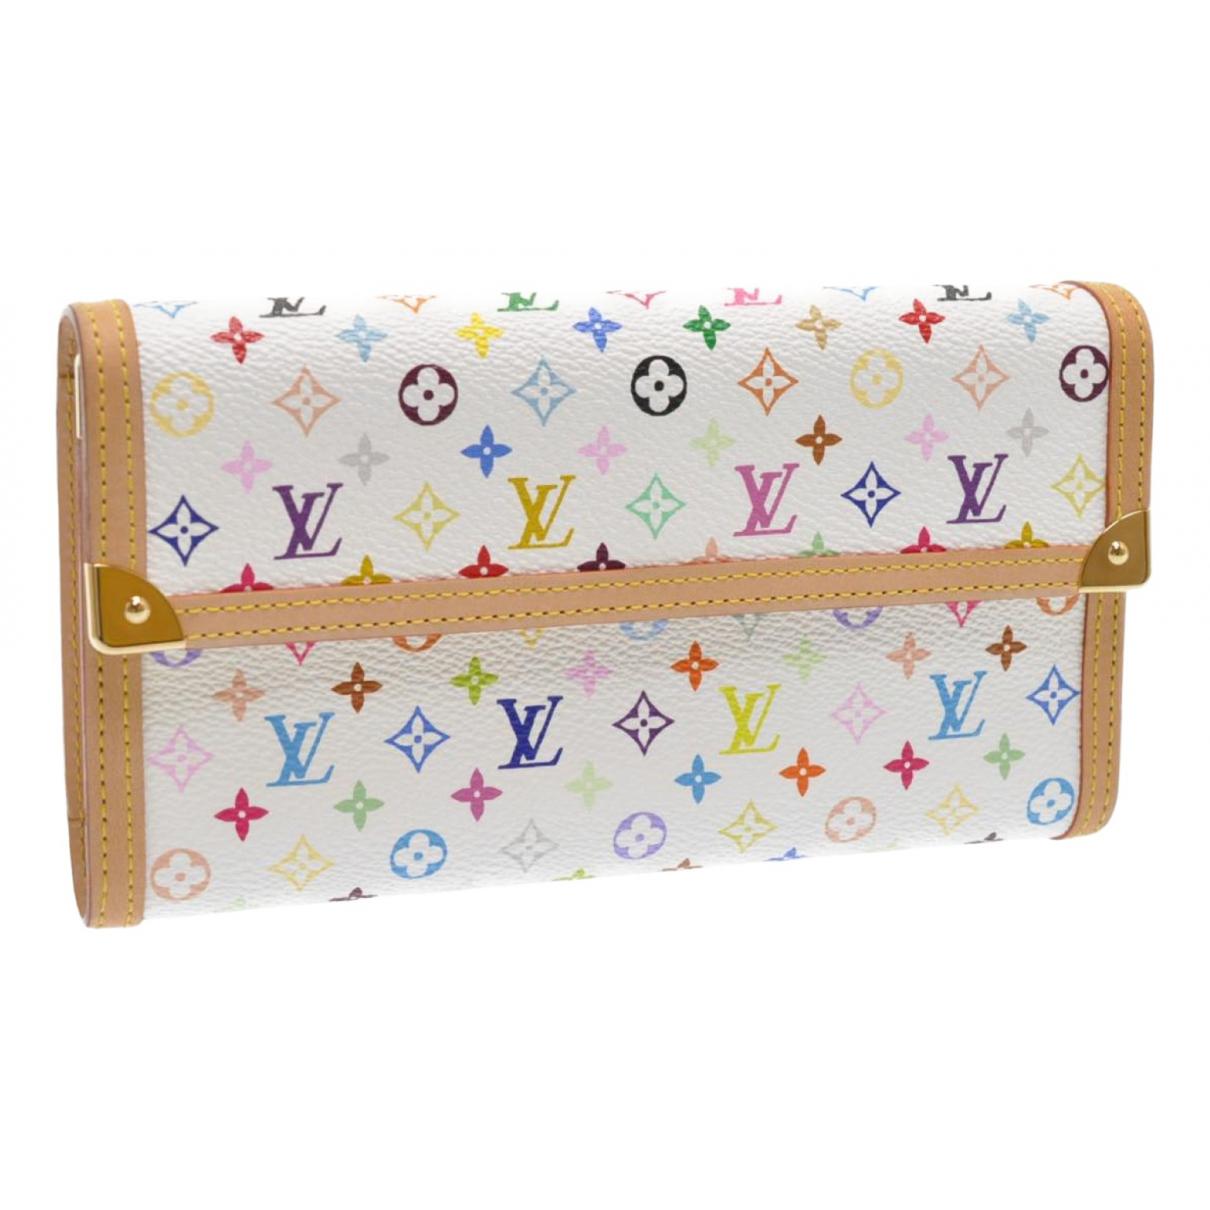 Louis Vuitton N White Cloth wallet for Women N